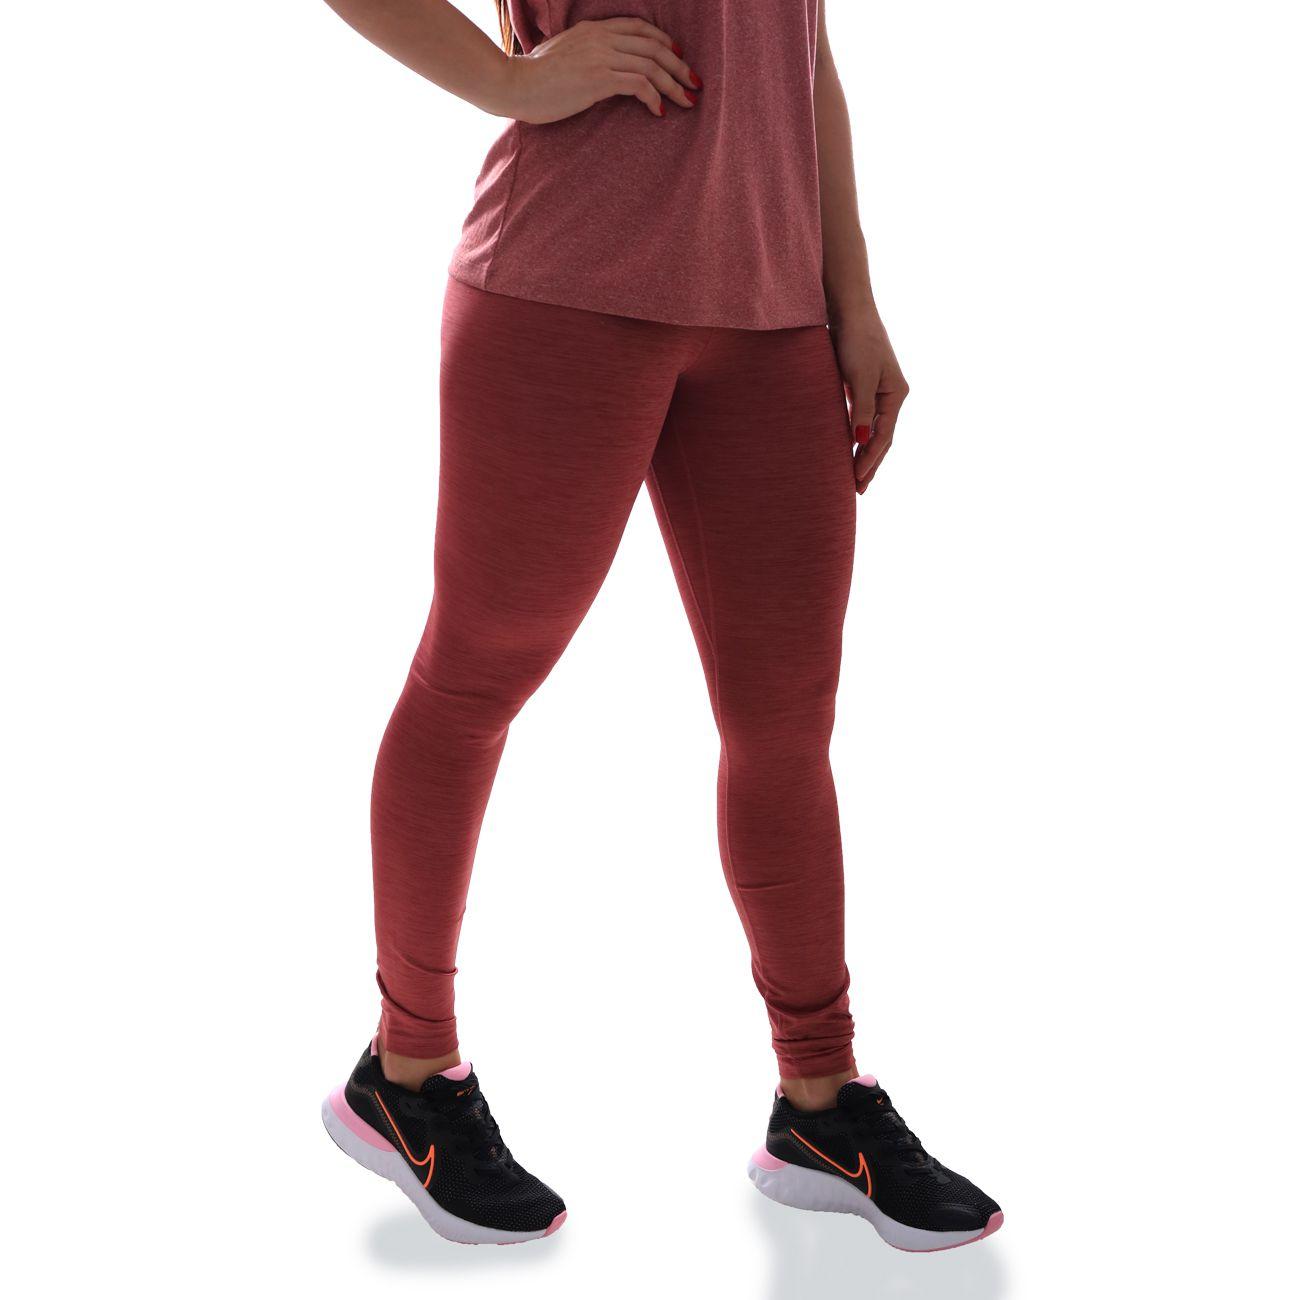 Calça Legging Nike One Rose